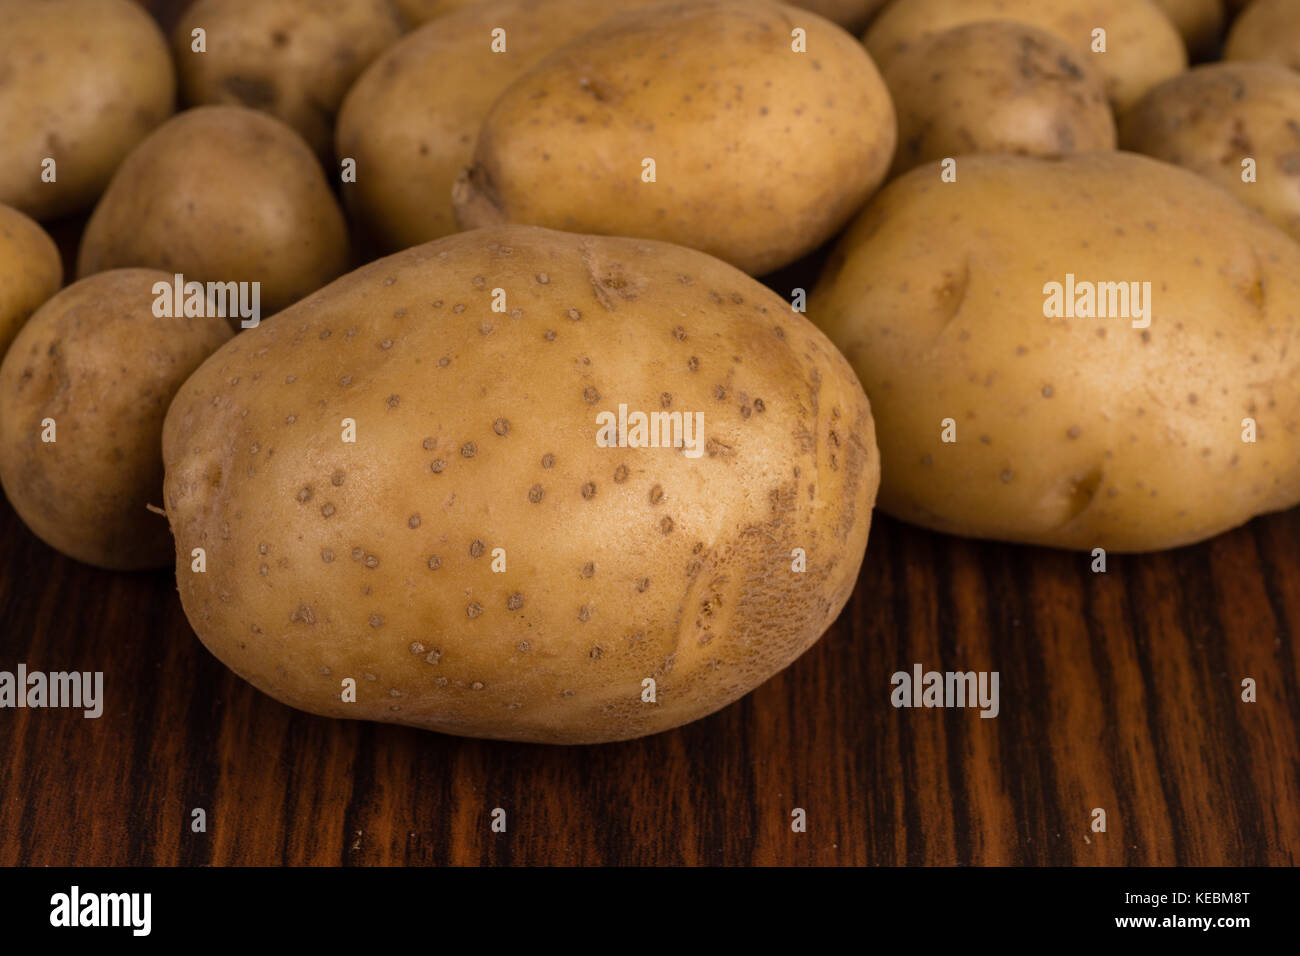 Pile of raw potatoes Stock Photo